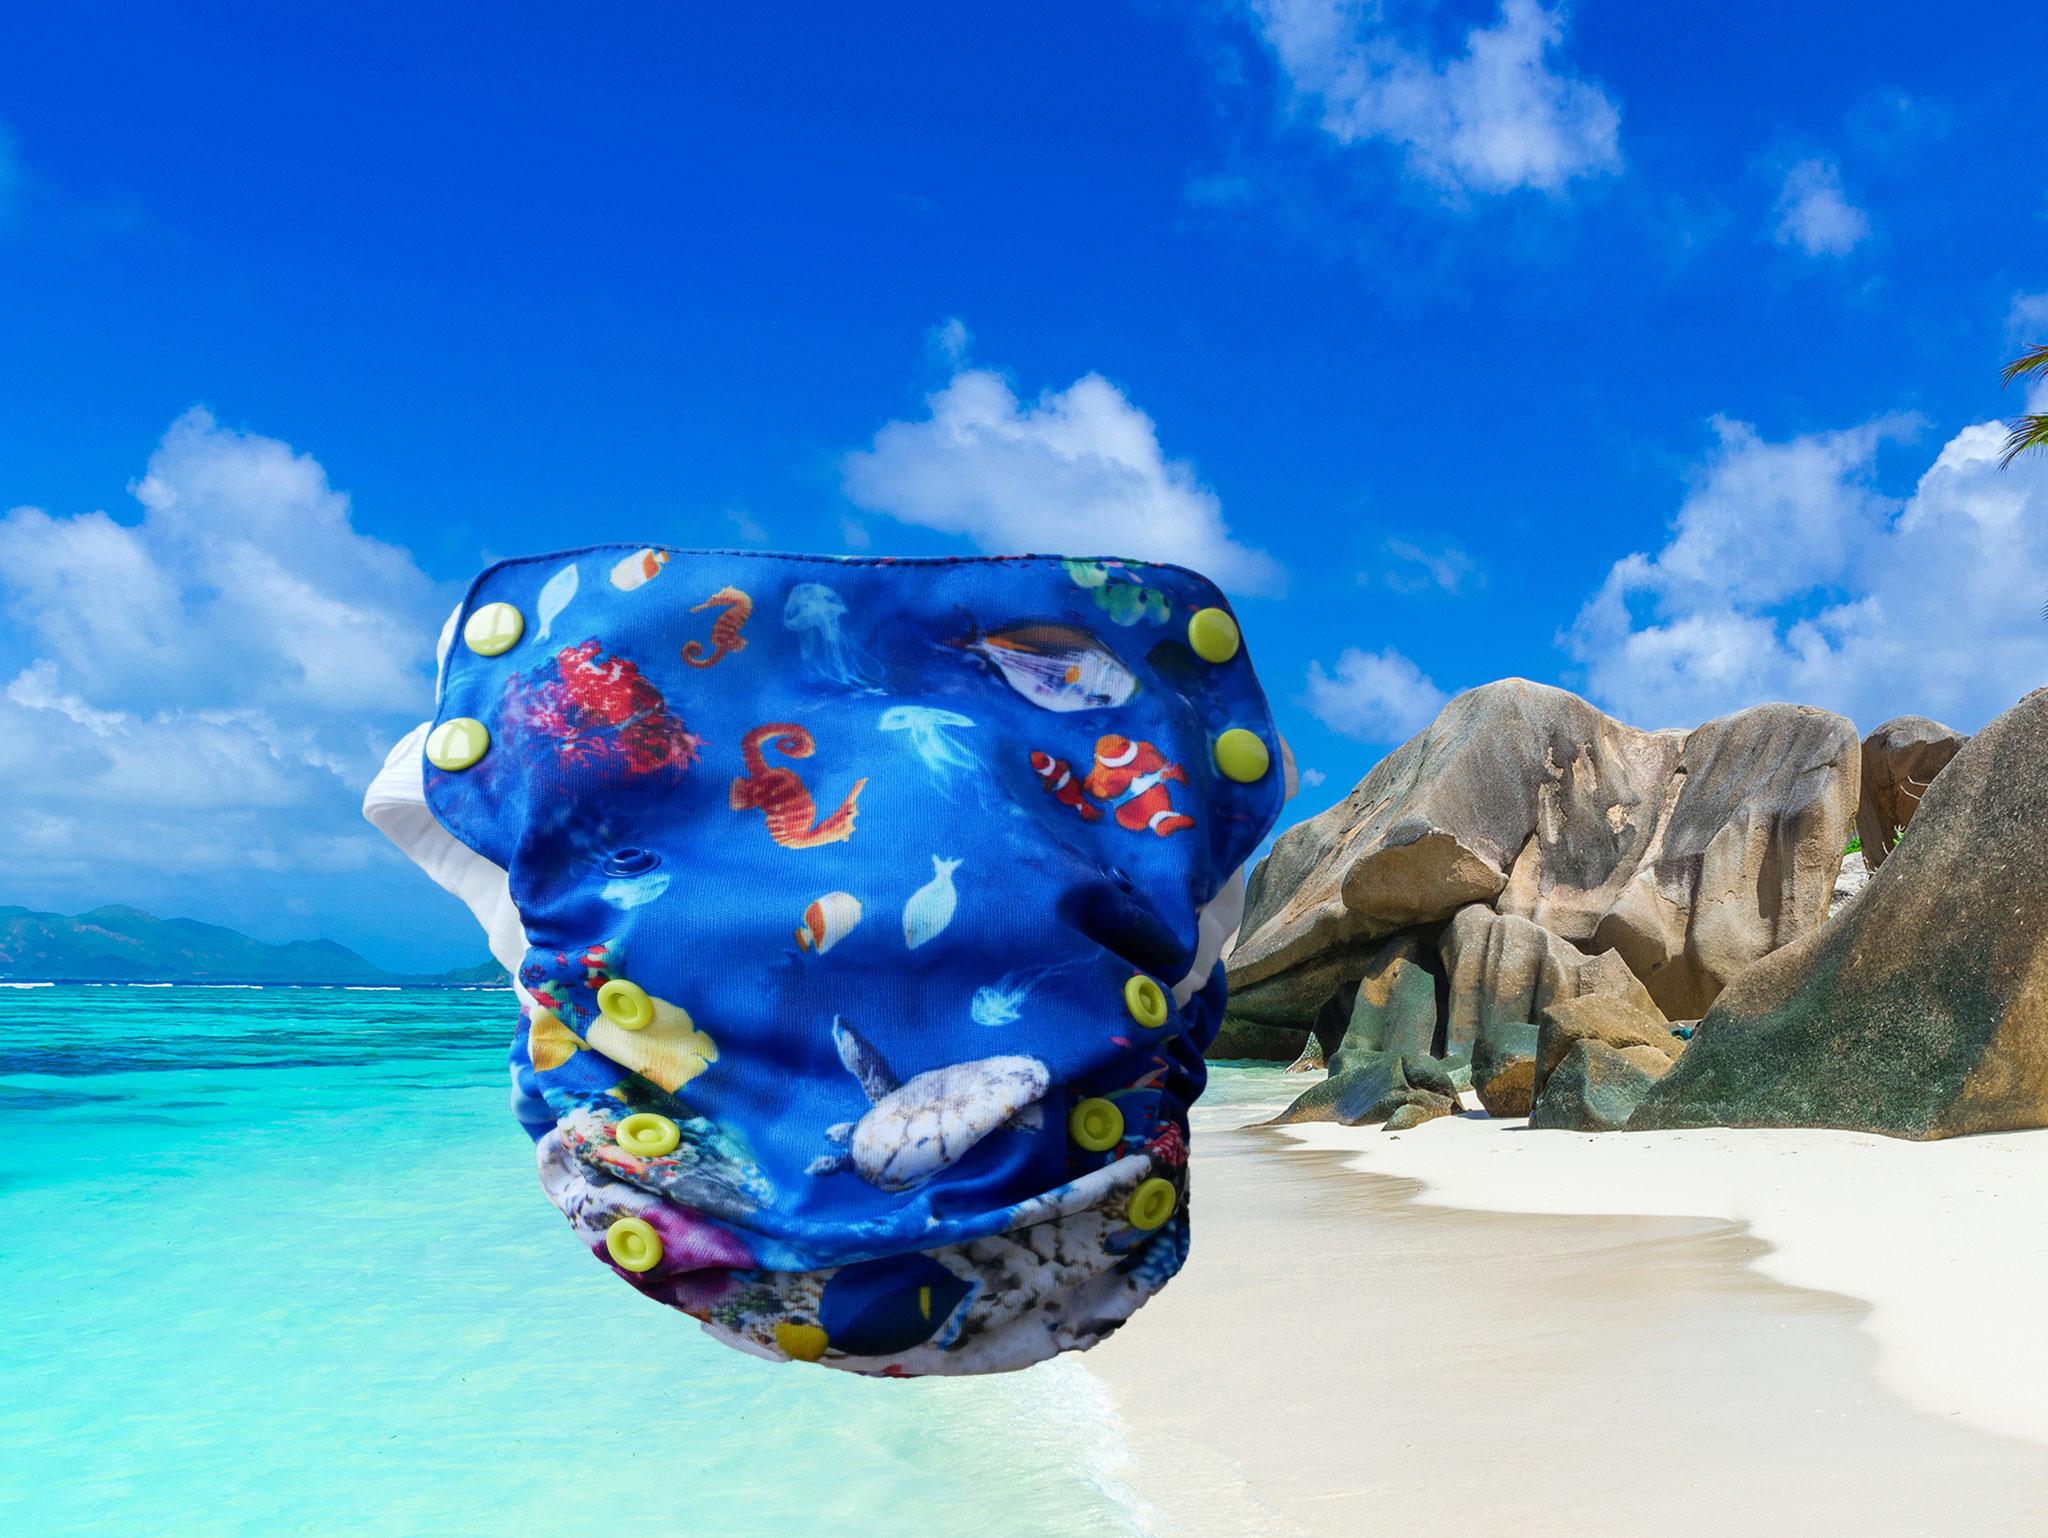 Magabi Swimming - Urlaubsfeeling